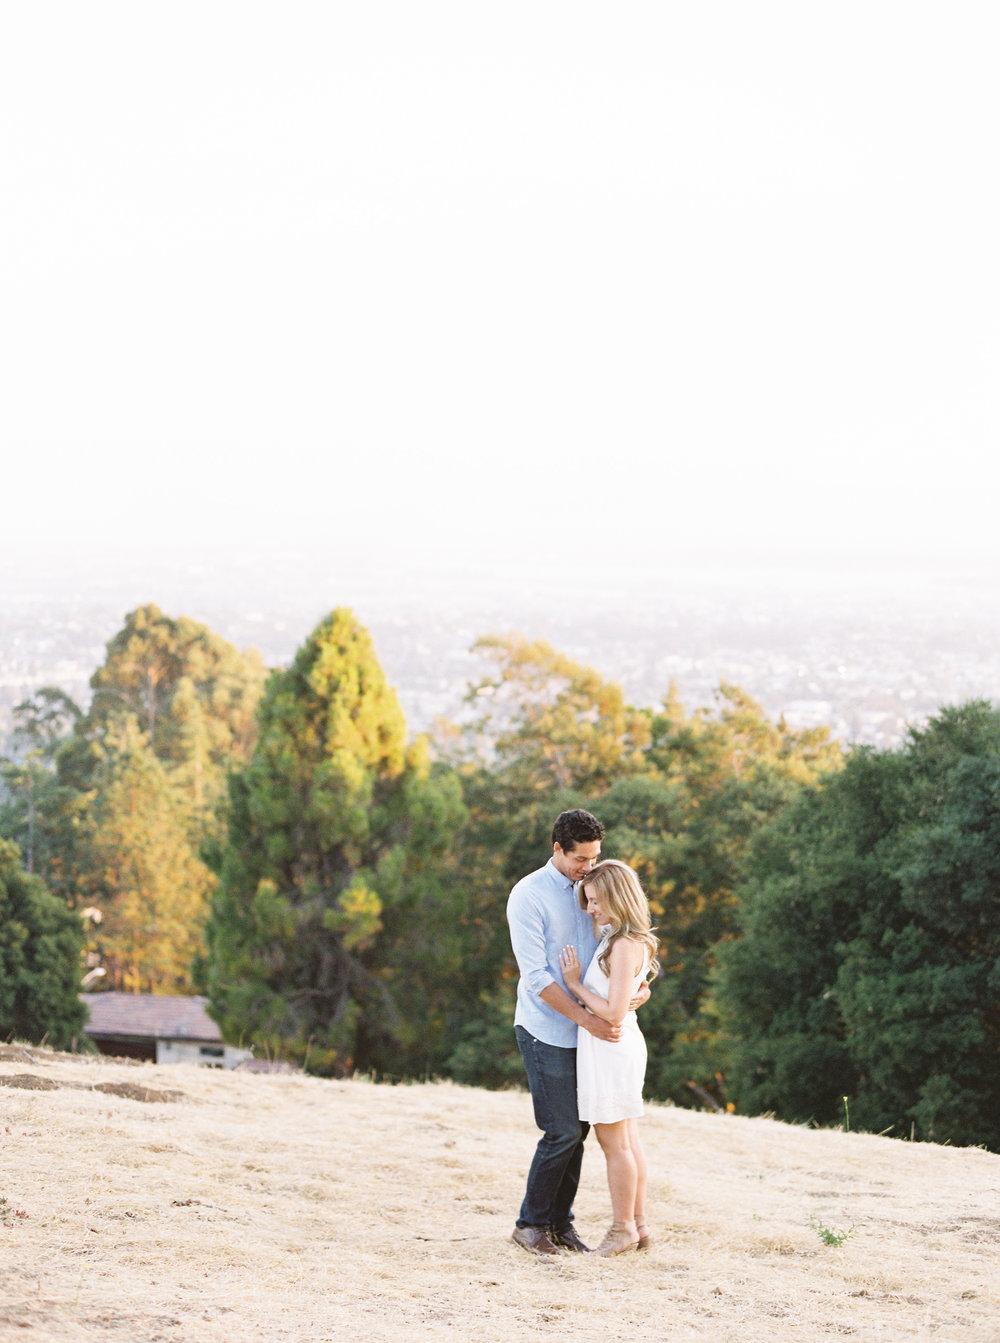 redwood-forest-engagement-in-oakland-california-64.jpg